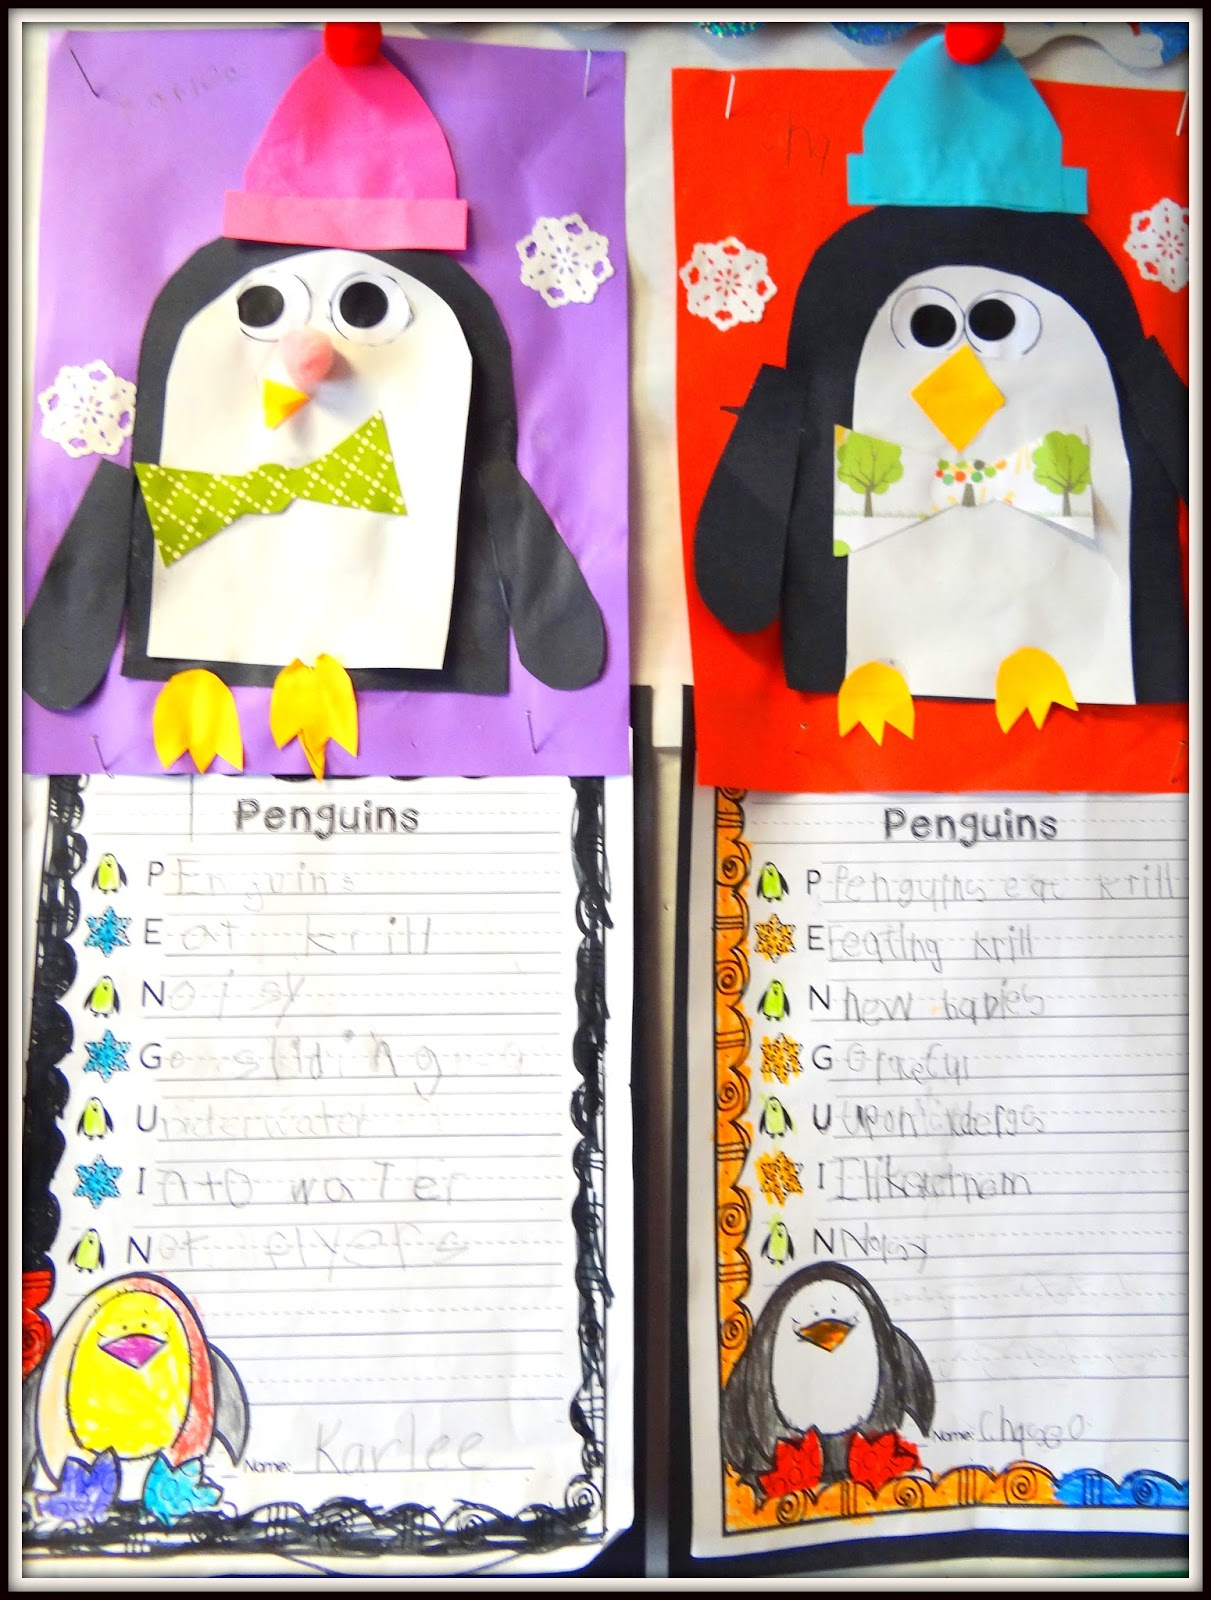 Patties Classroom Penguin Art And Acrostic Poems